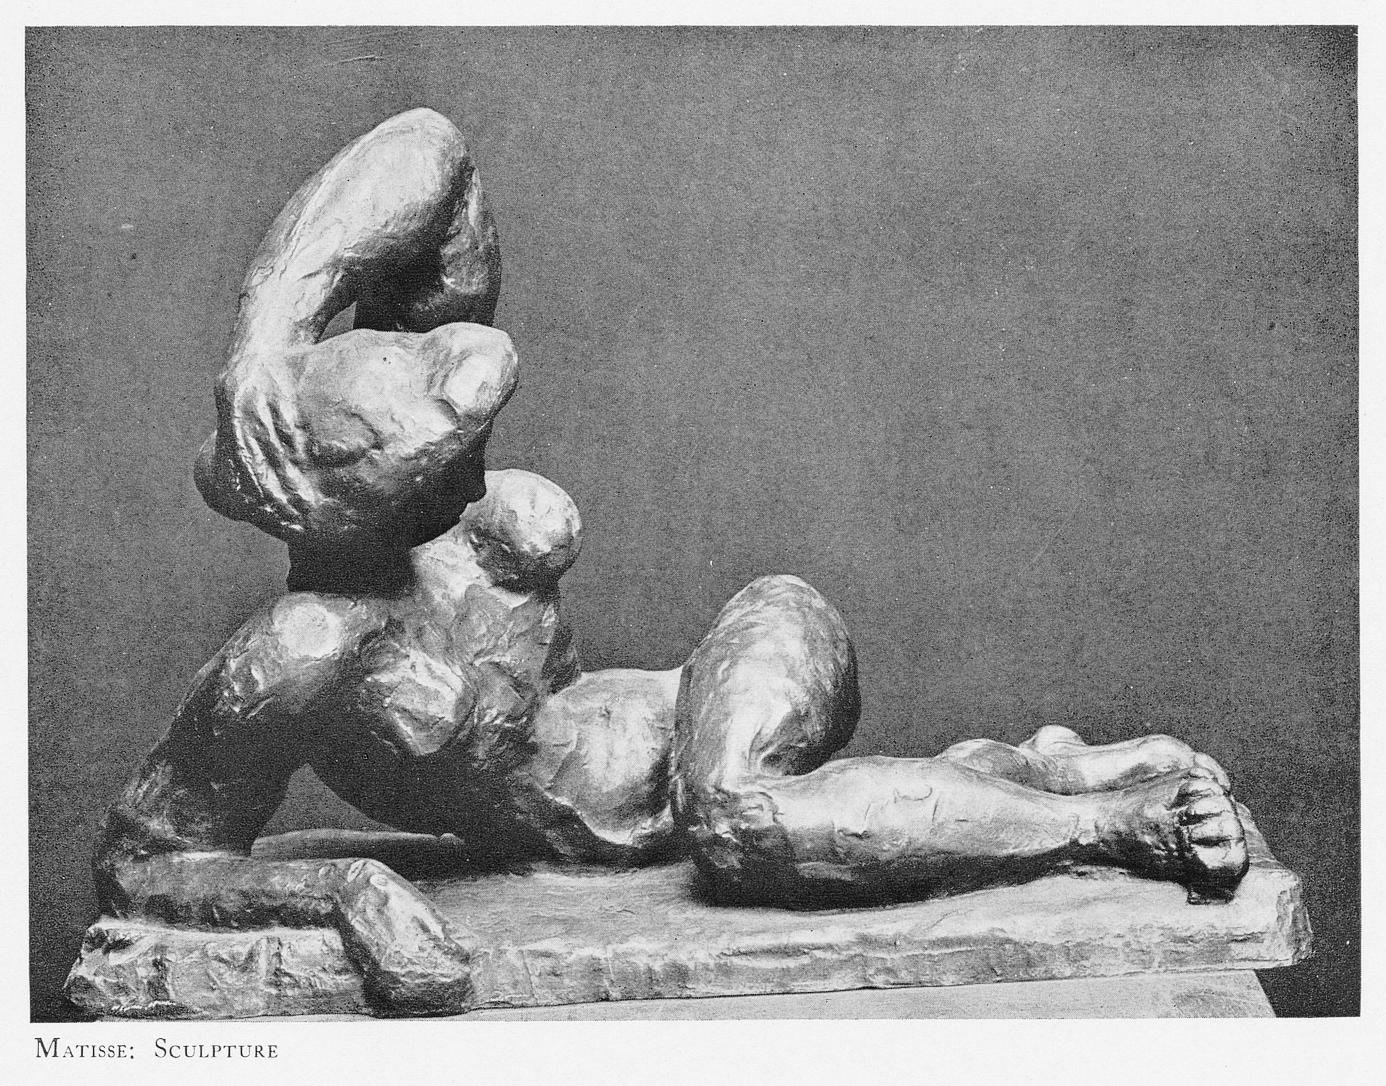 blue nude souvenir de biskra henri matisse 1906 07 nu couchatildecopy i aurore reclining nude i exhibited at montross gallery new york 1915